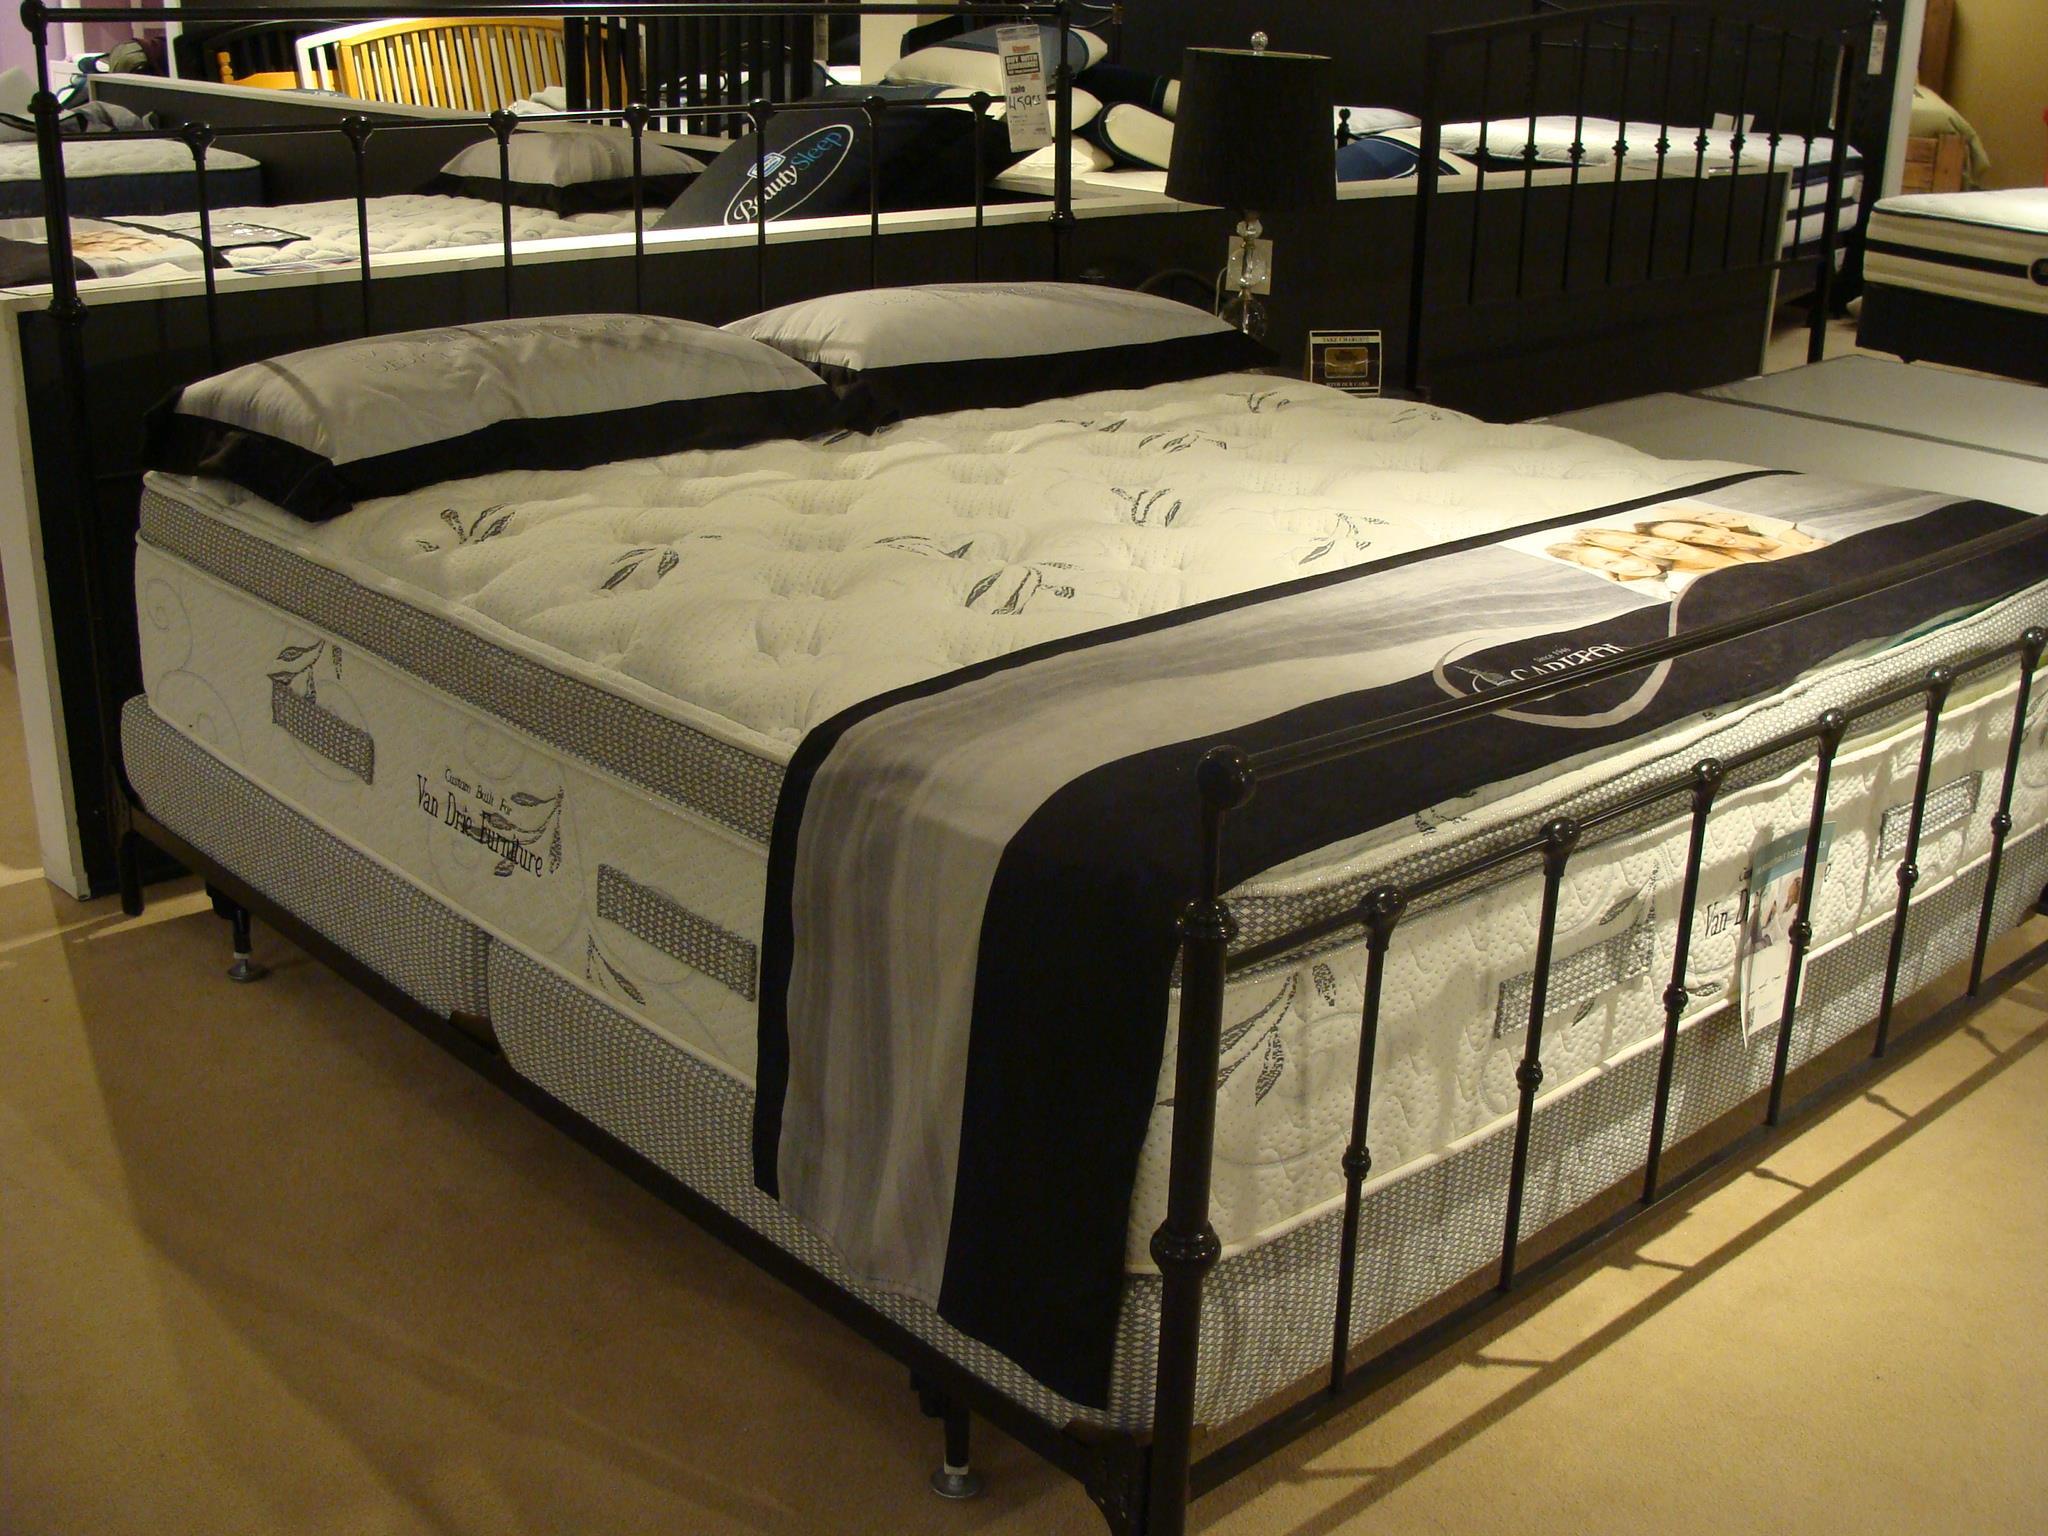 Capitol Bedding Opulence Full Pillow Top Mattress Set - Item Number: PillowTop-F+HMI-F